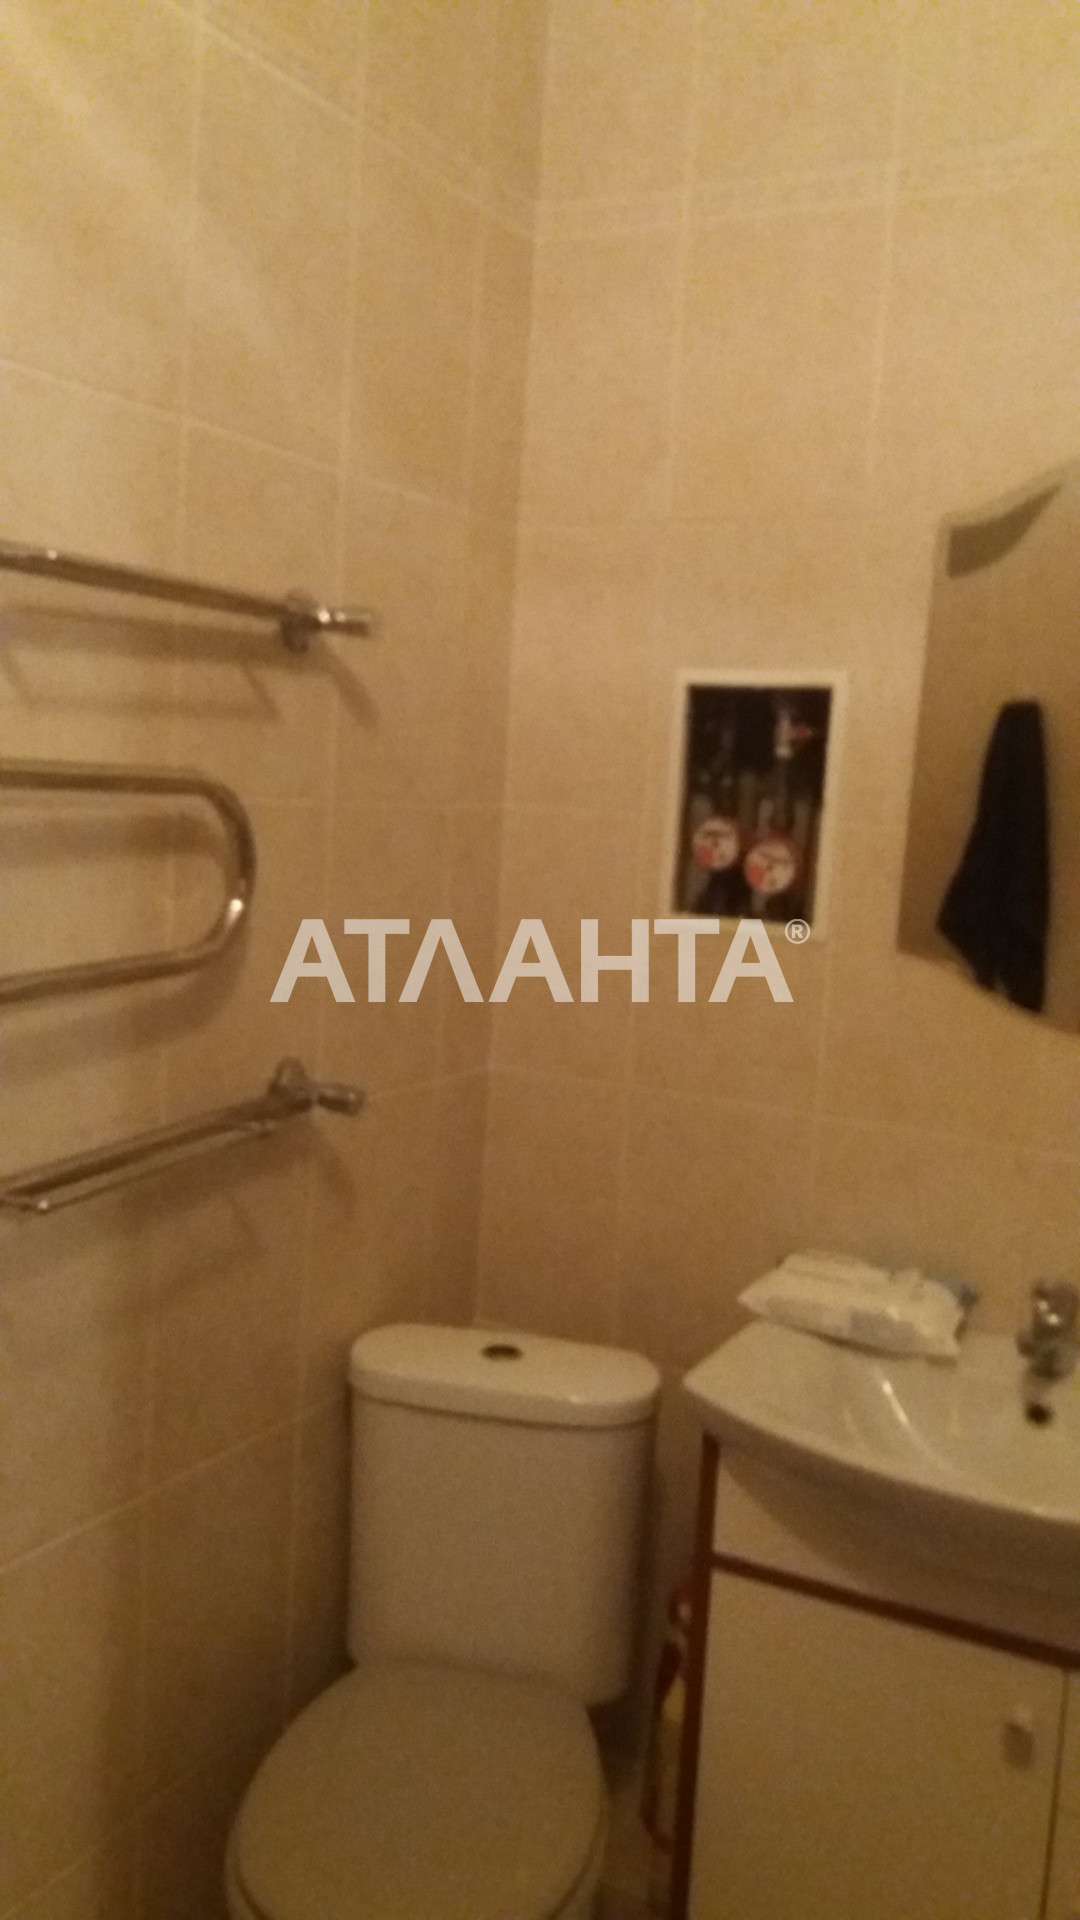 Продается 1-комнатная Квартира на ул. Александрийская — 29 000 у.е. (фото №4)